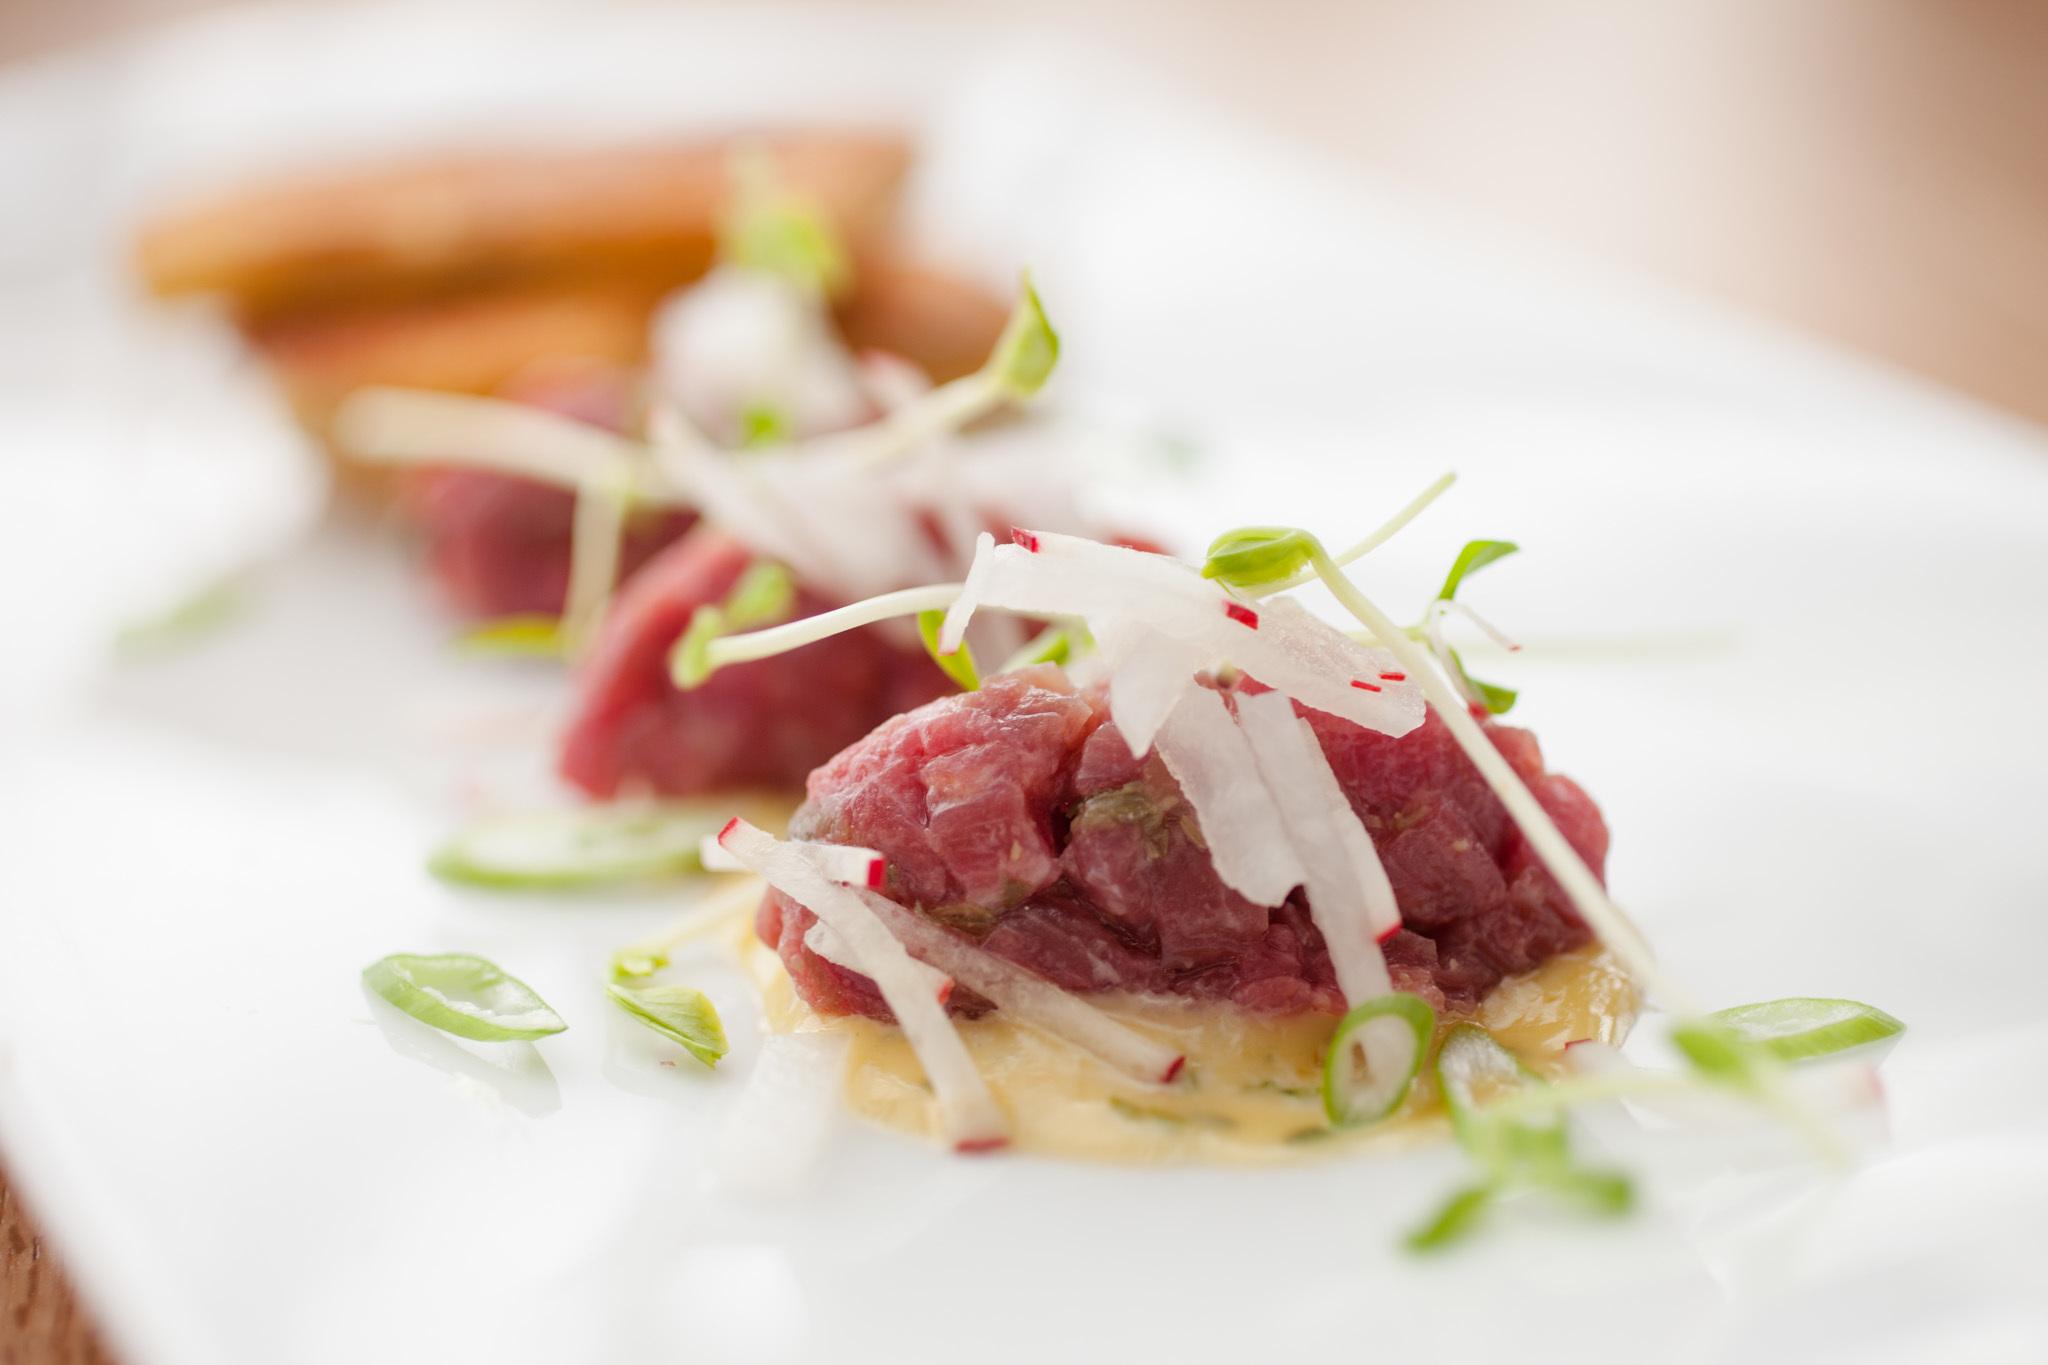 Beef tartare at Taus Authentic